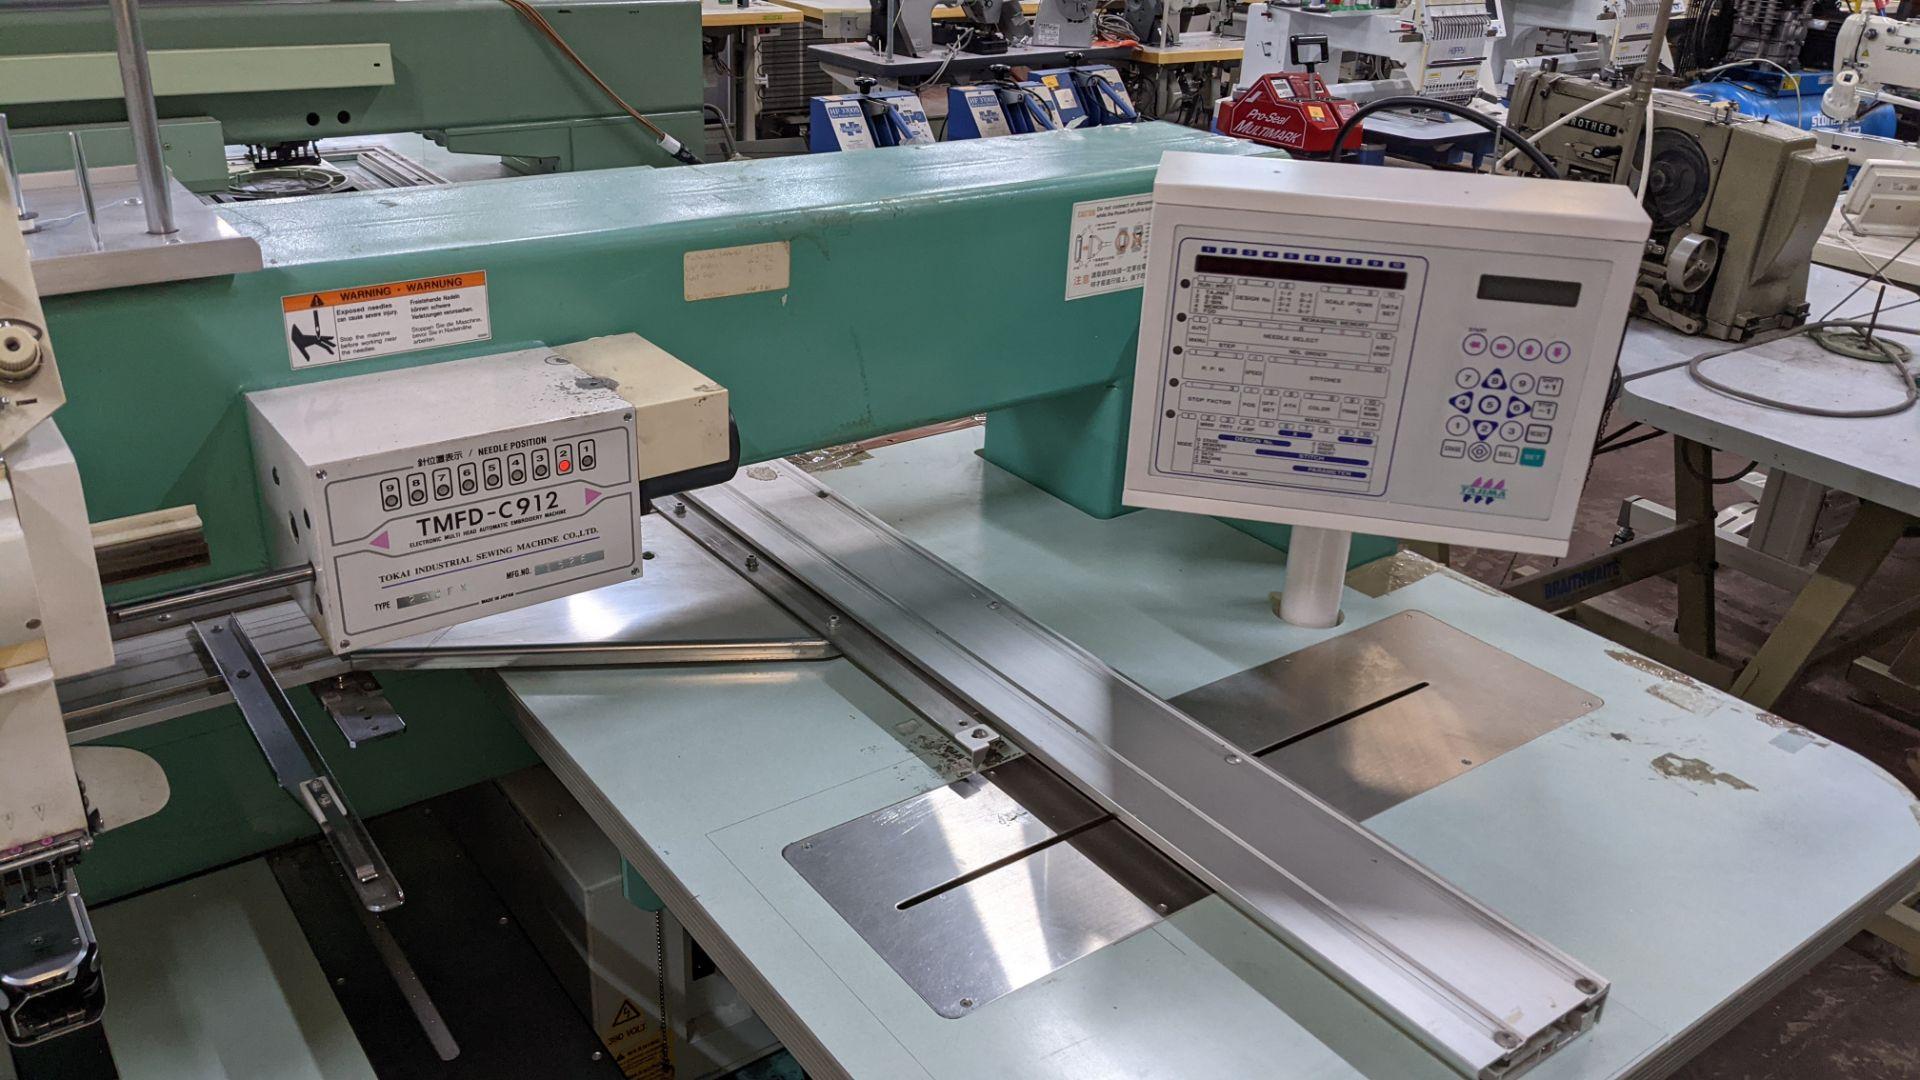 Tokai Tajima model TMFD-C912 electronic 12 head embroidery machine, type 2-2FX - Image 9 of 27